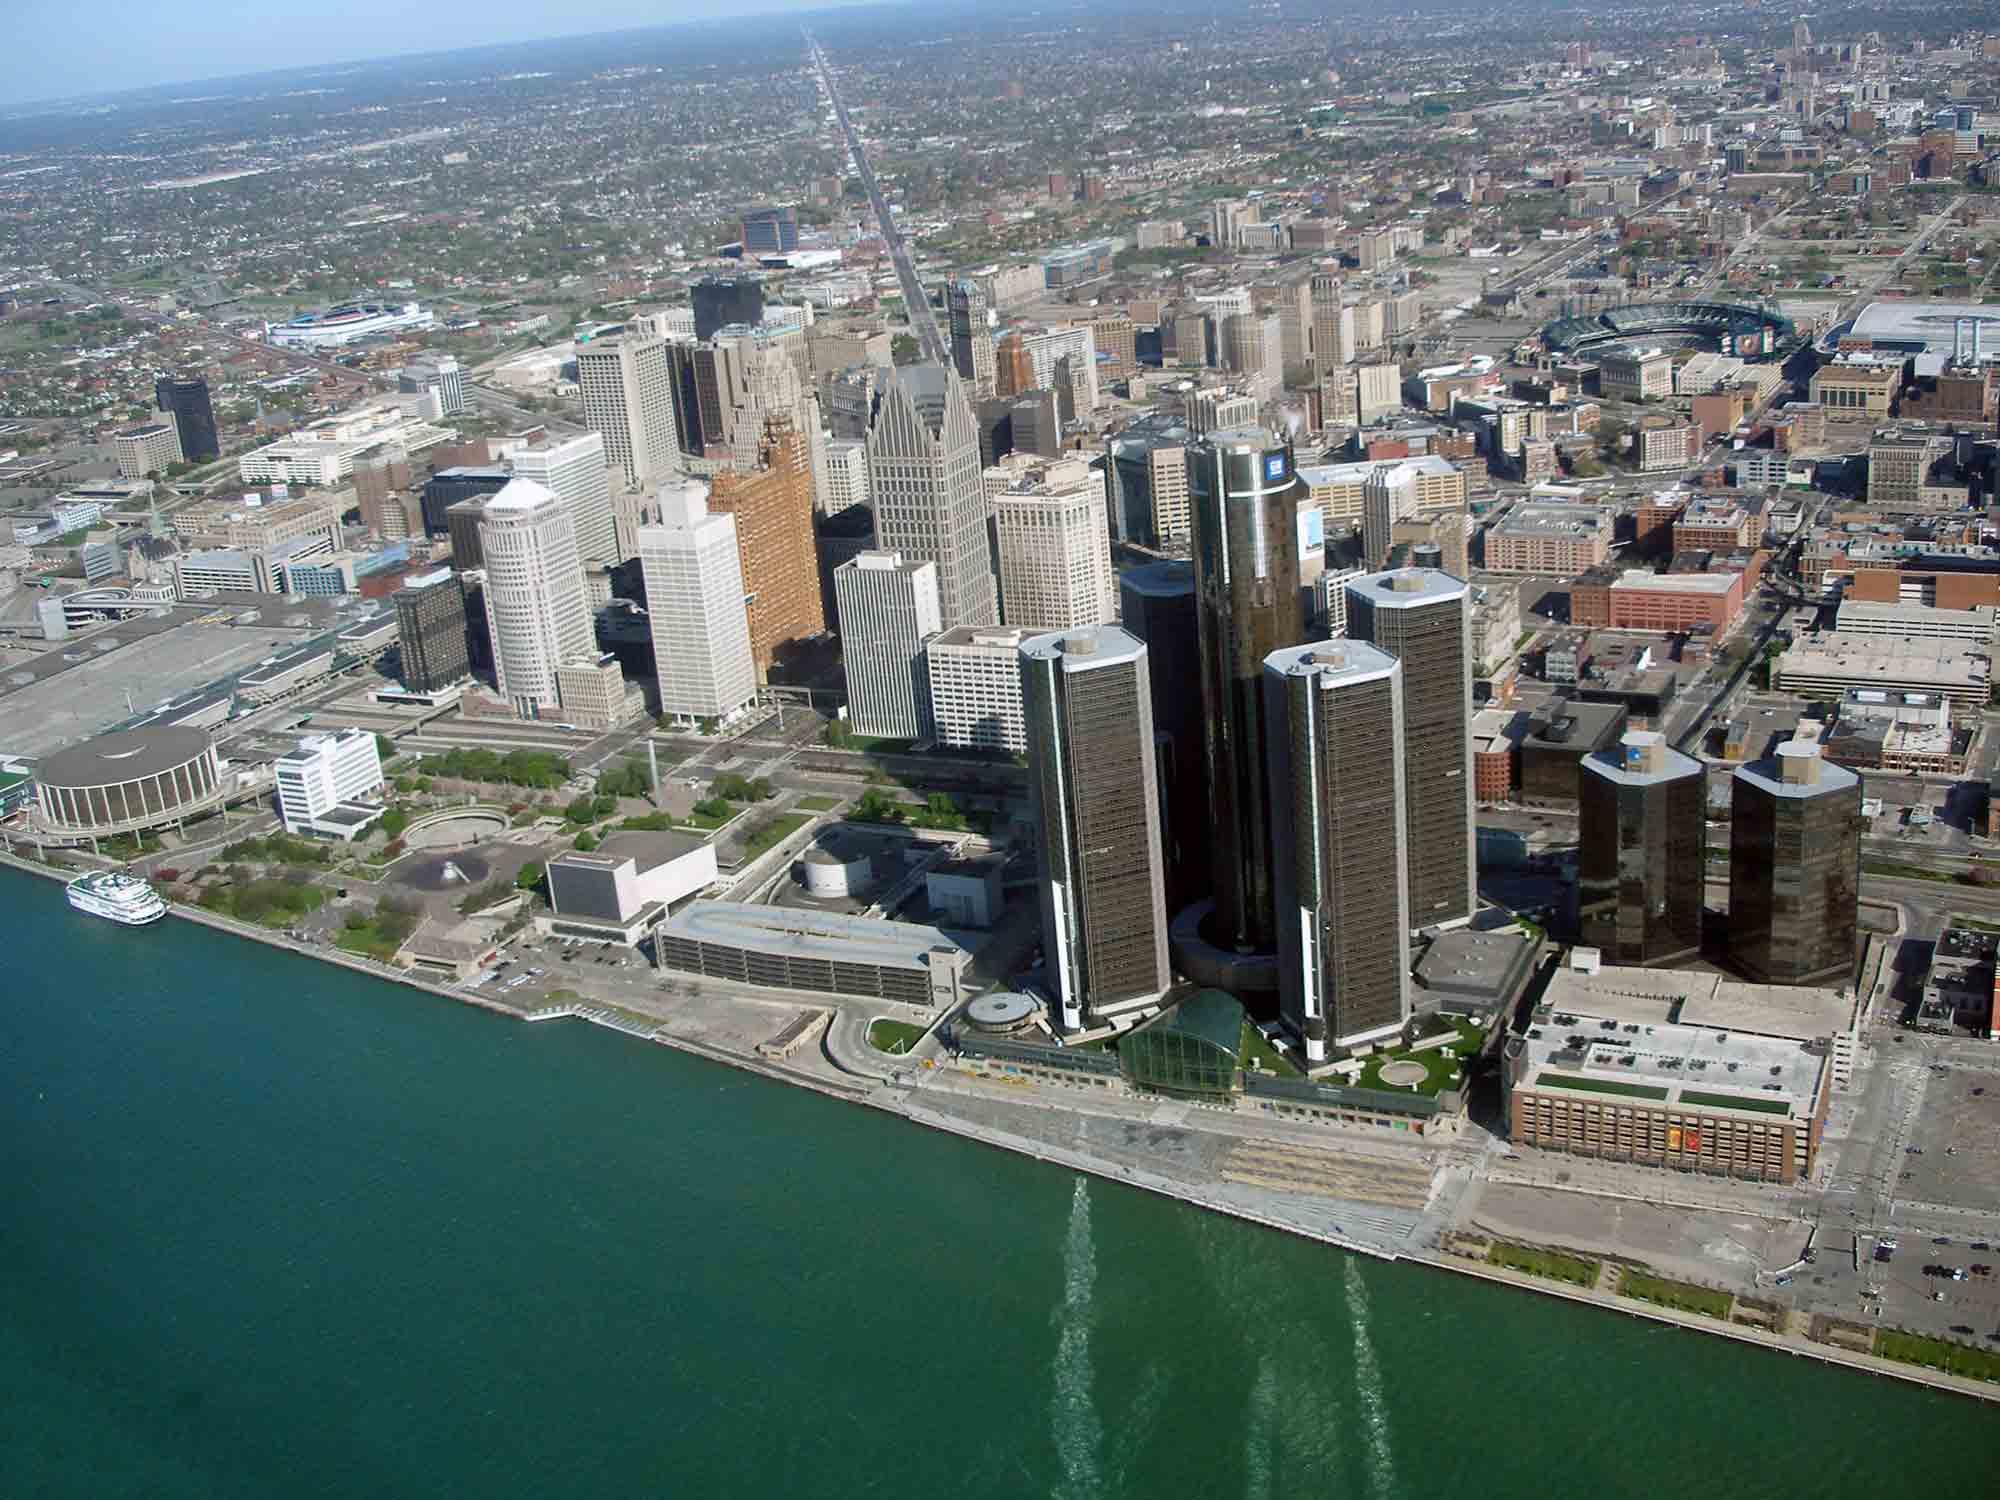 Detroit Riverfront. Image credit: Mary Bohling, Michigan Sea Grant